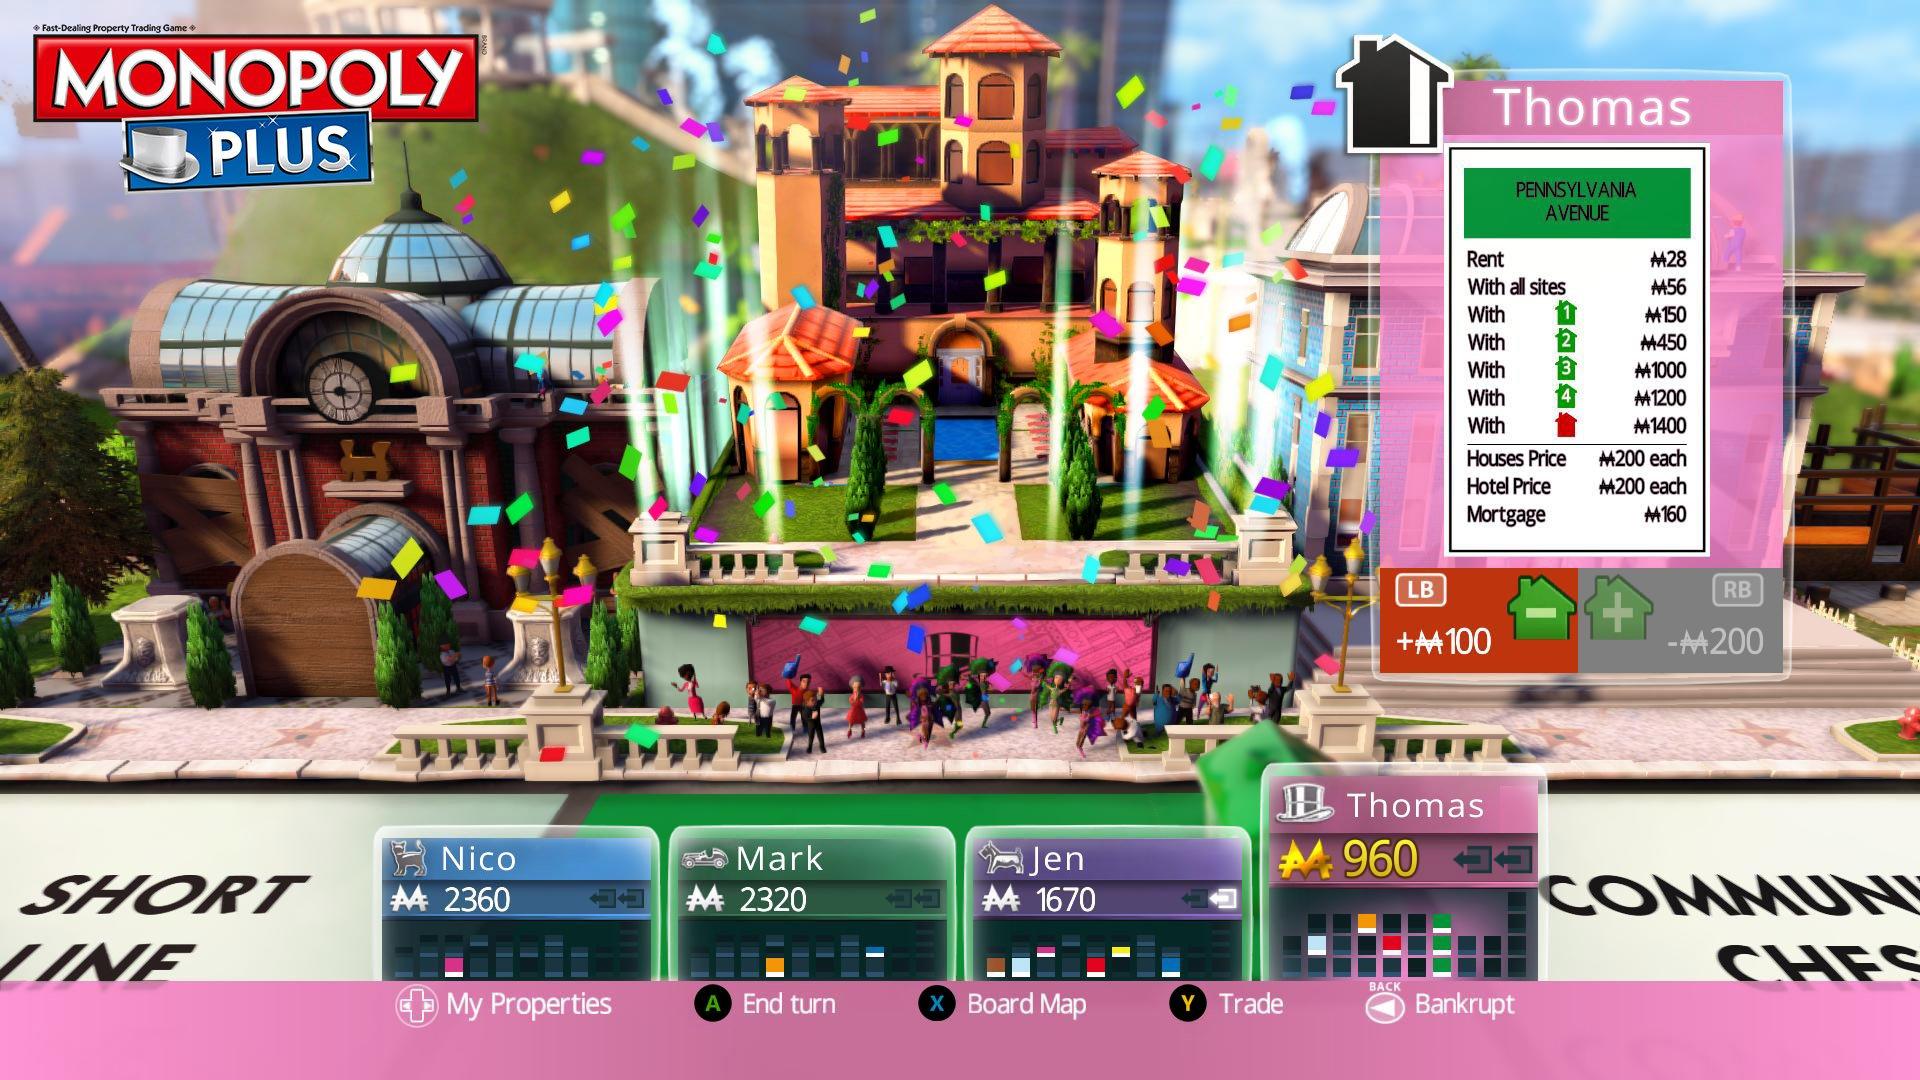 monopoly_plus-2590436.jpg